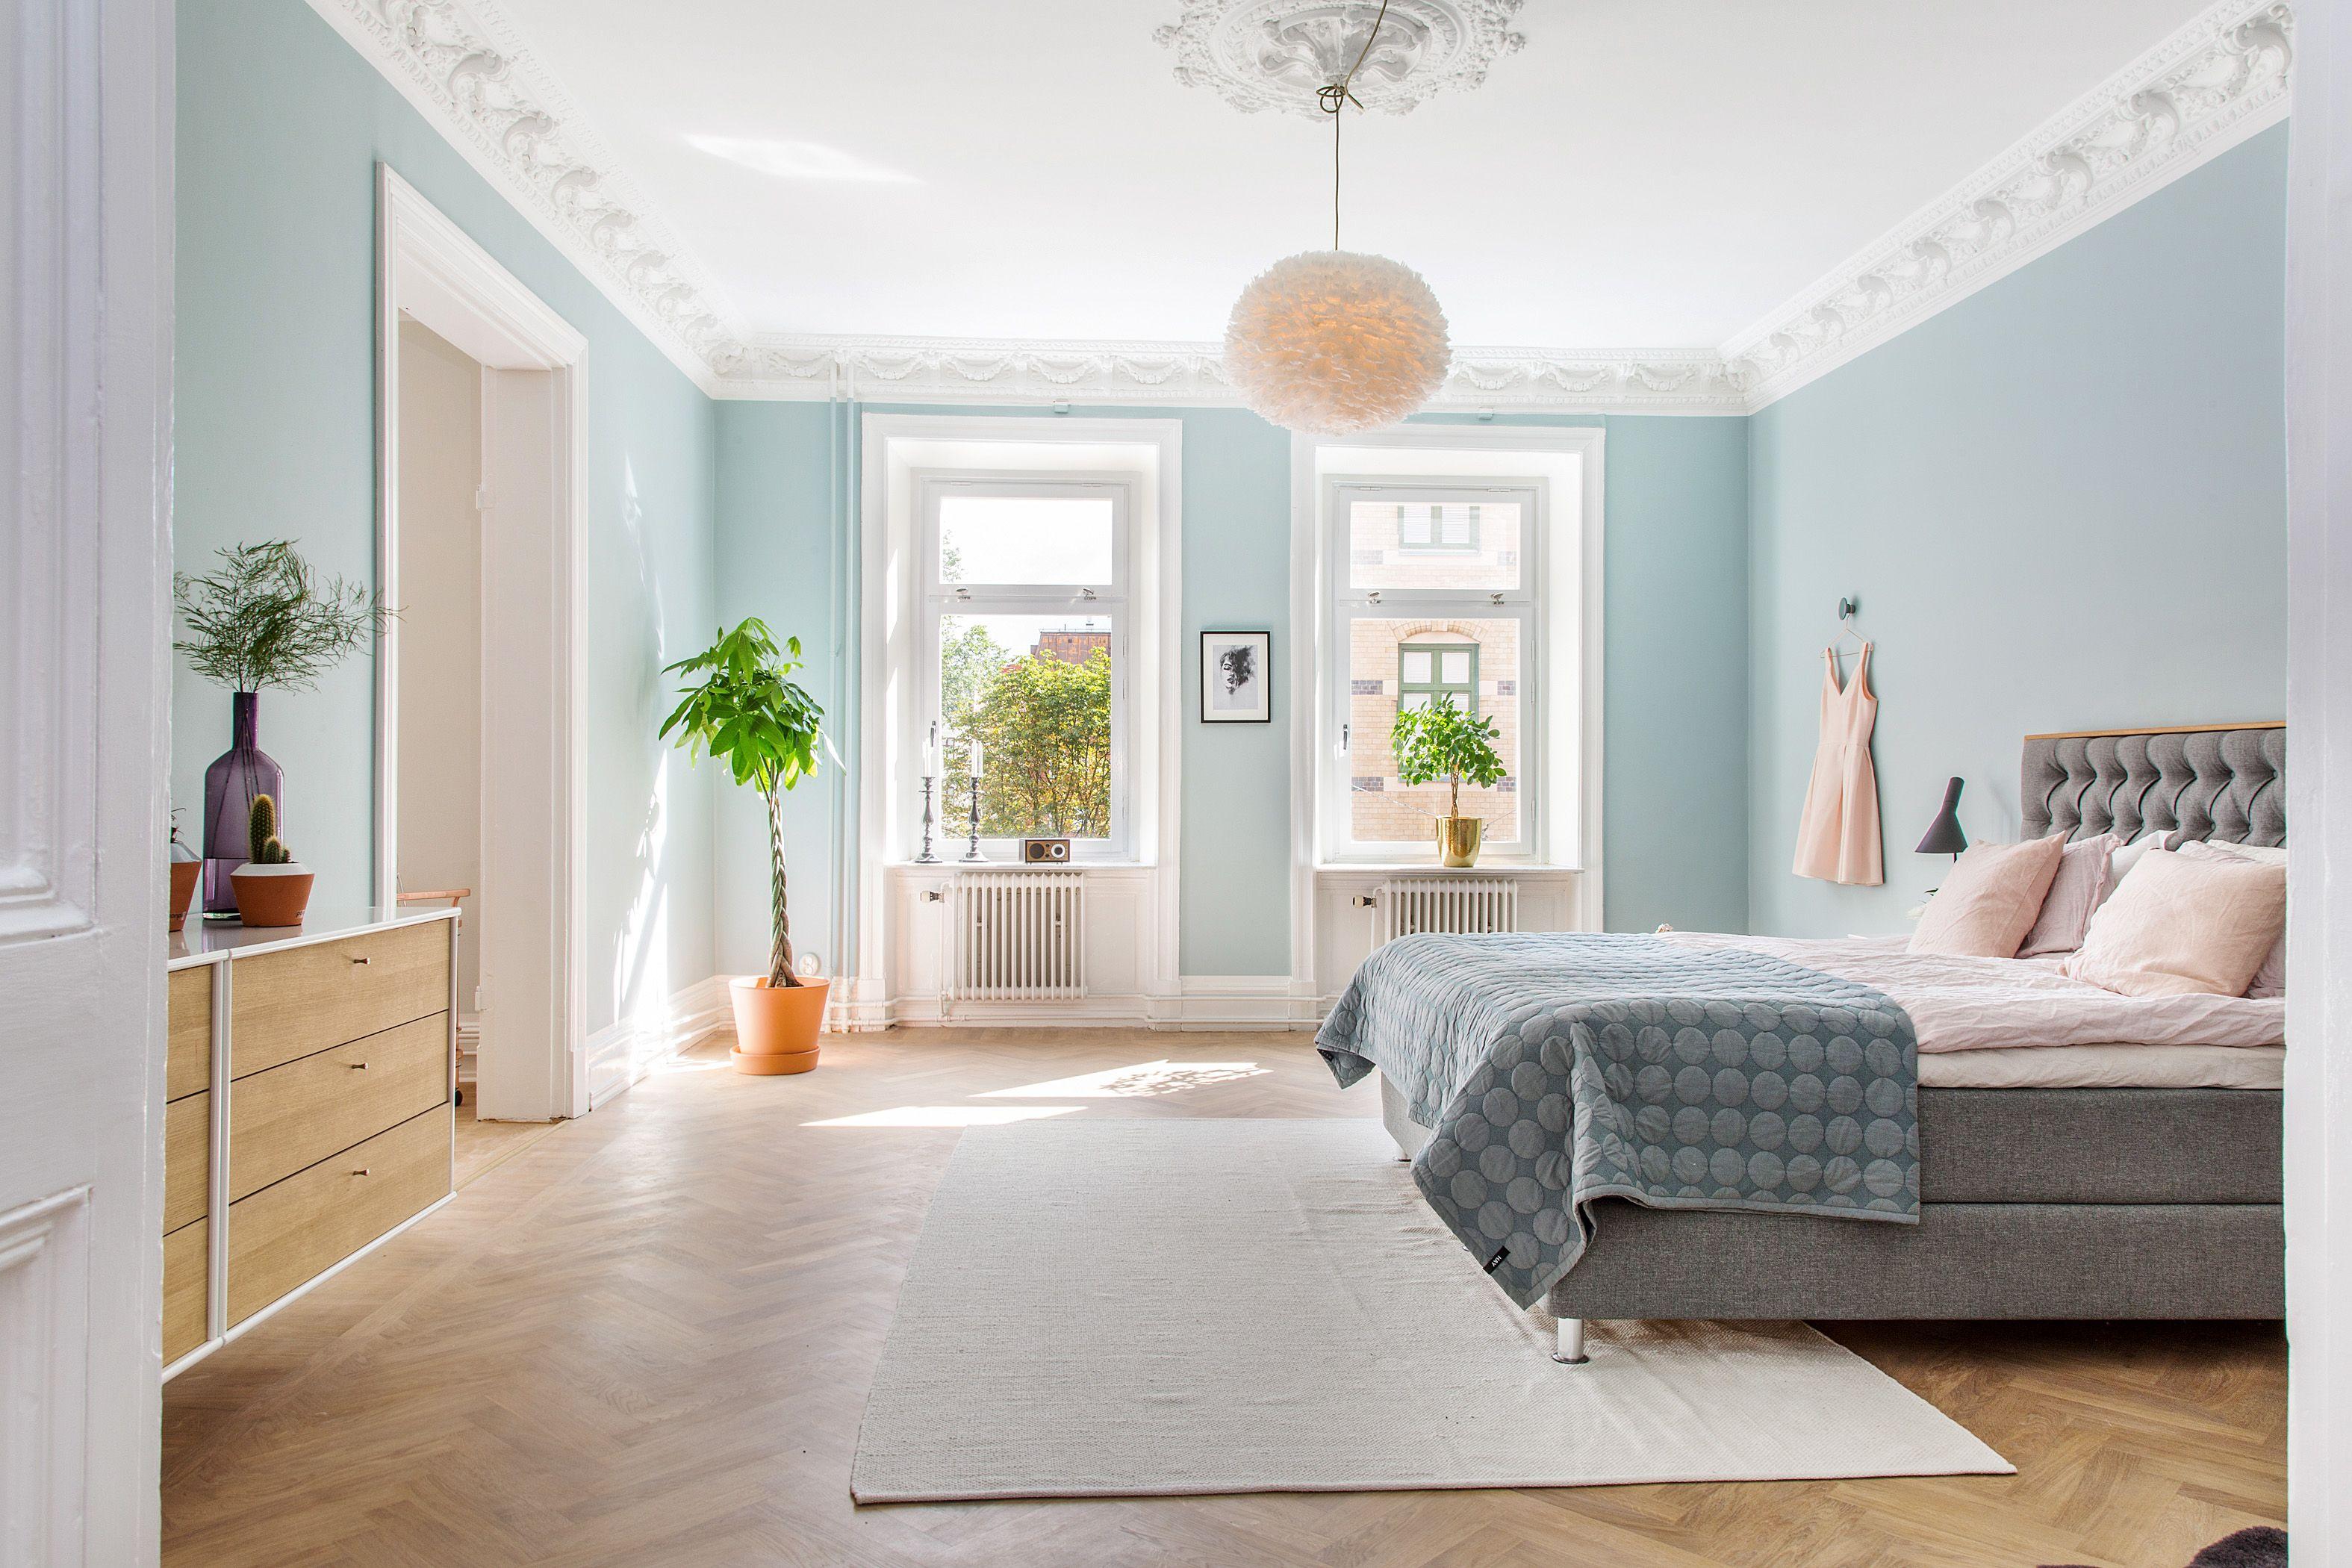 nicety Ceiling IdeasHome BedroomTom